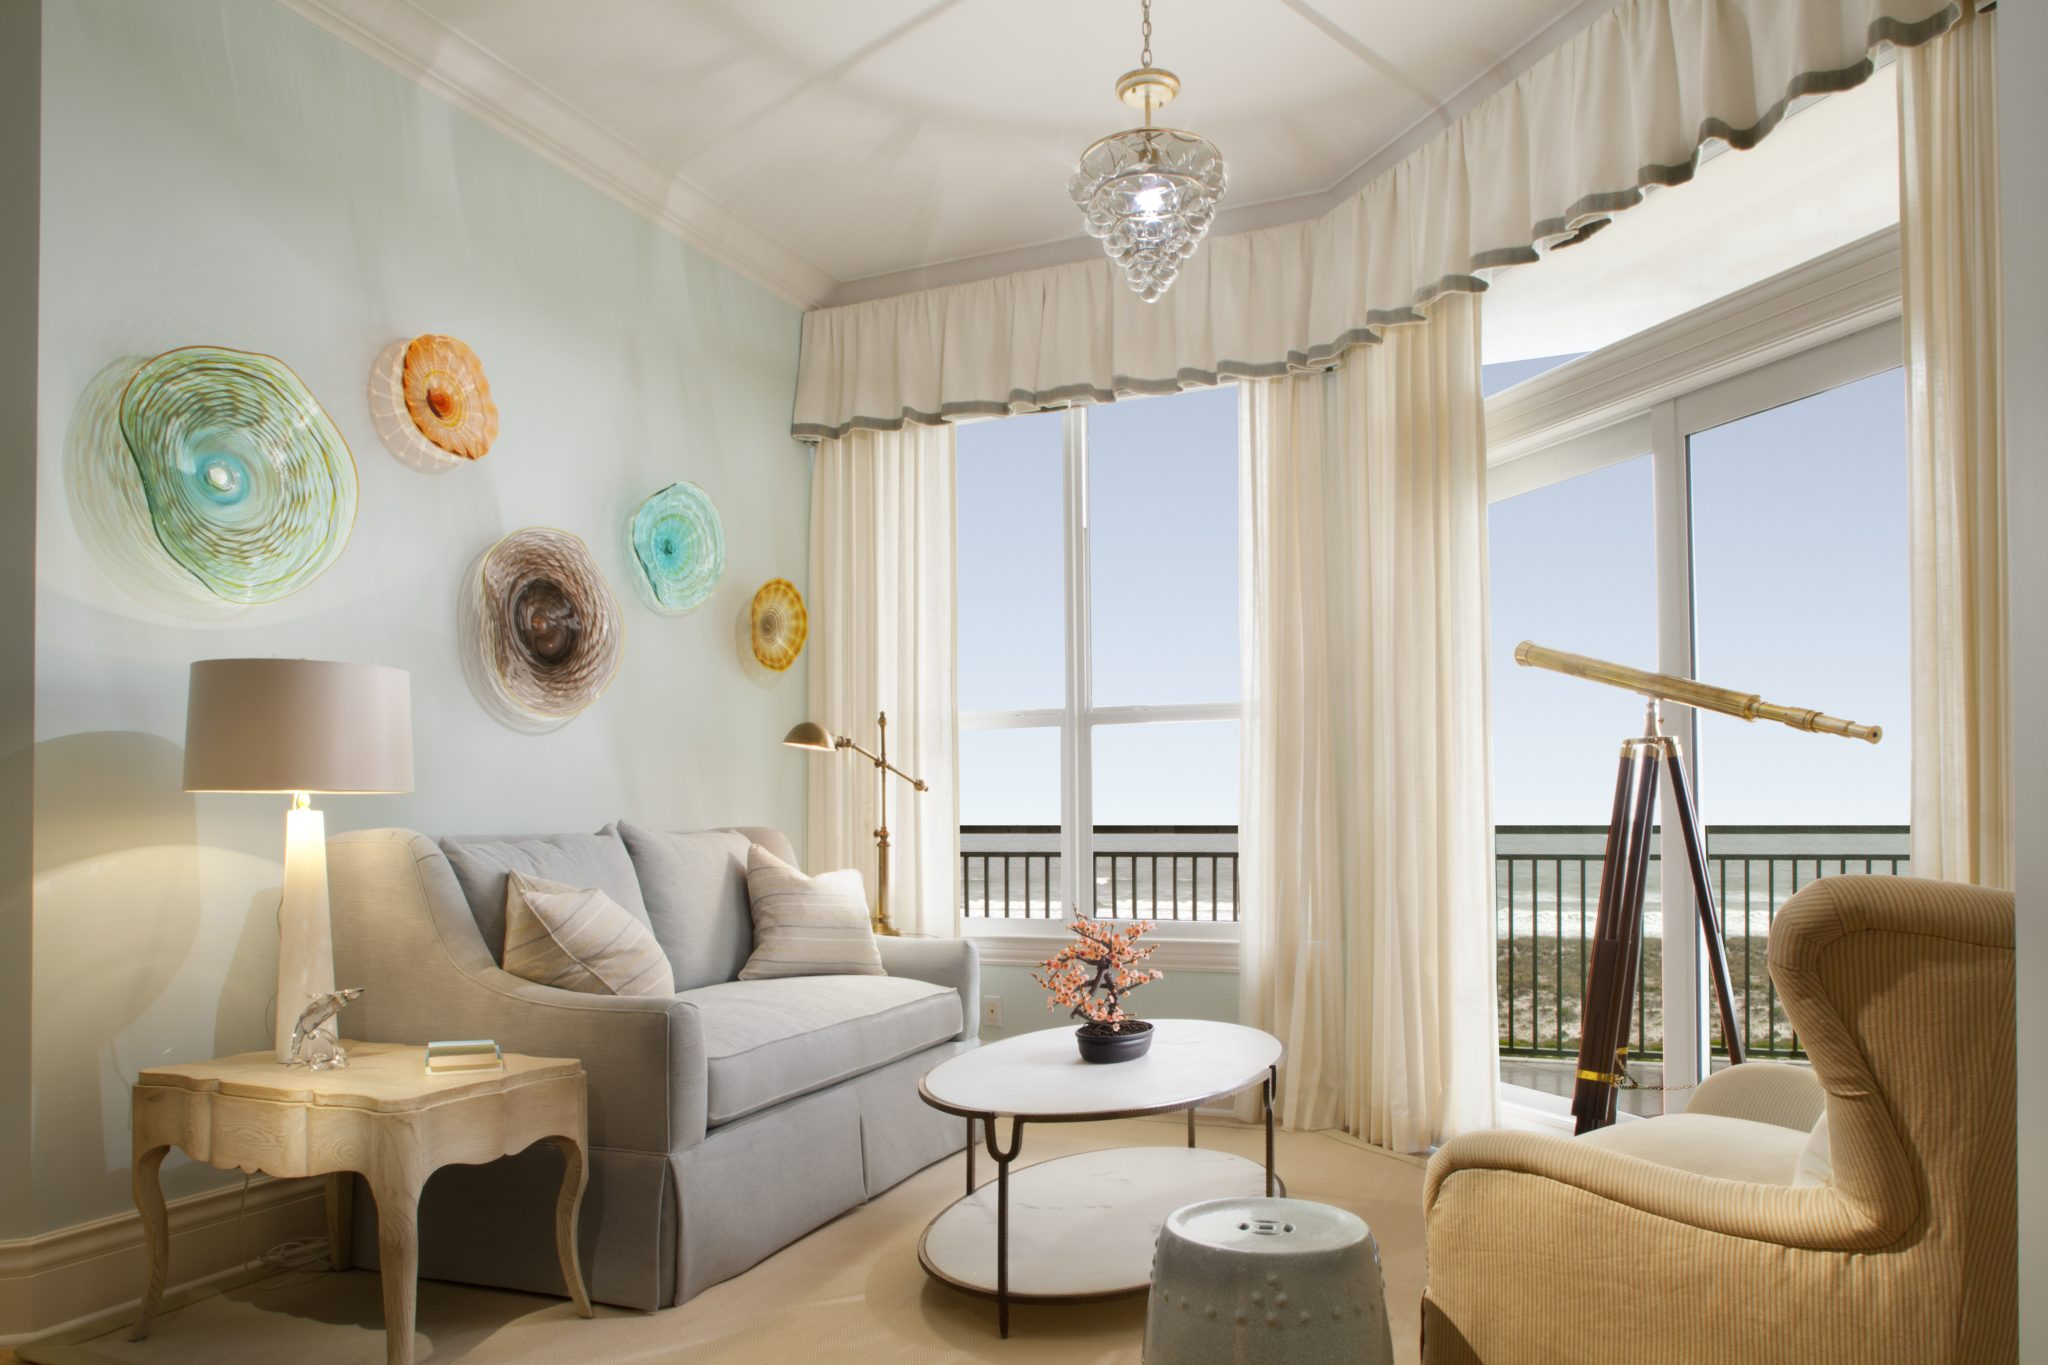 Coastal cottage condo master sitting room by Amanda Webster Design, Inc.